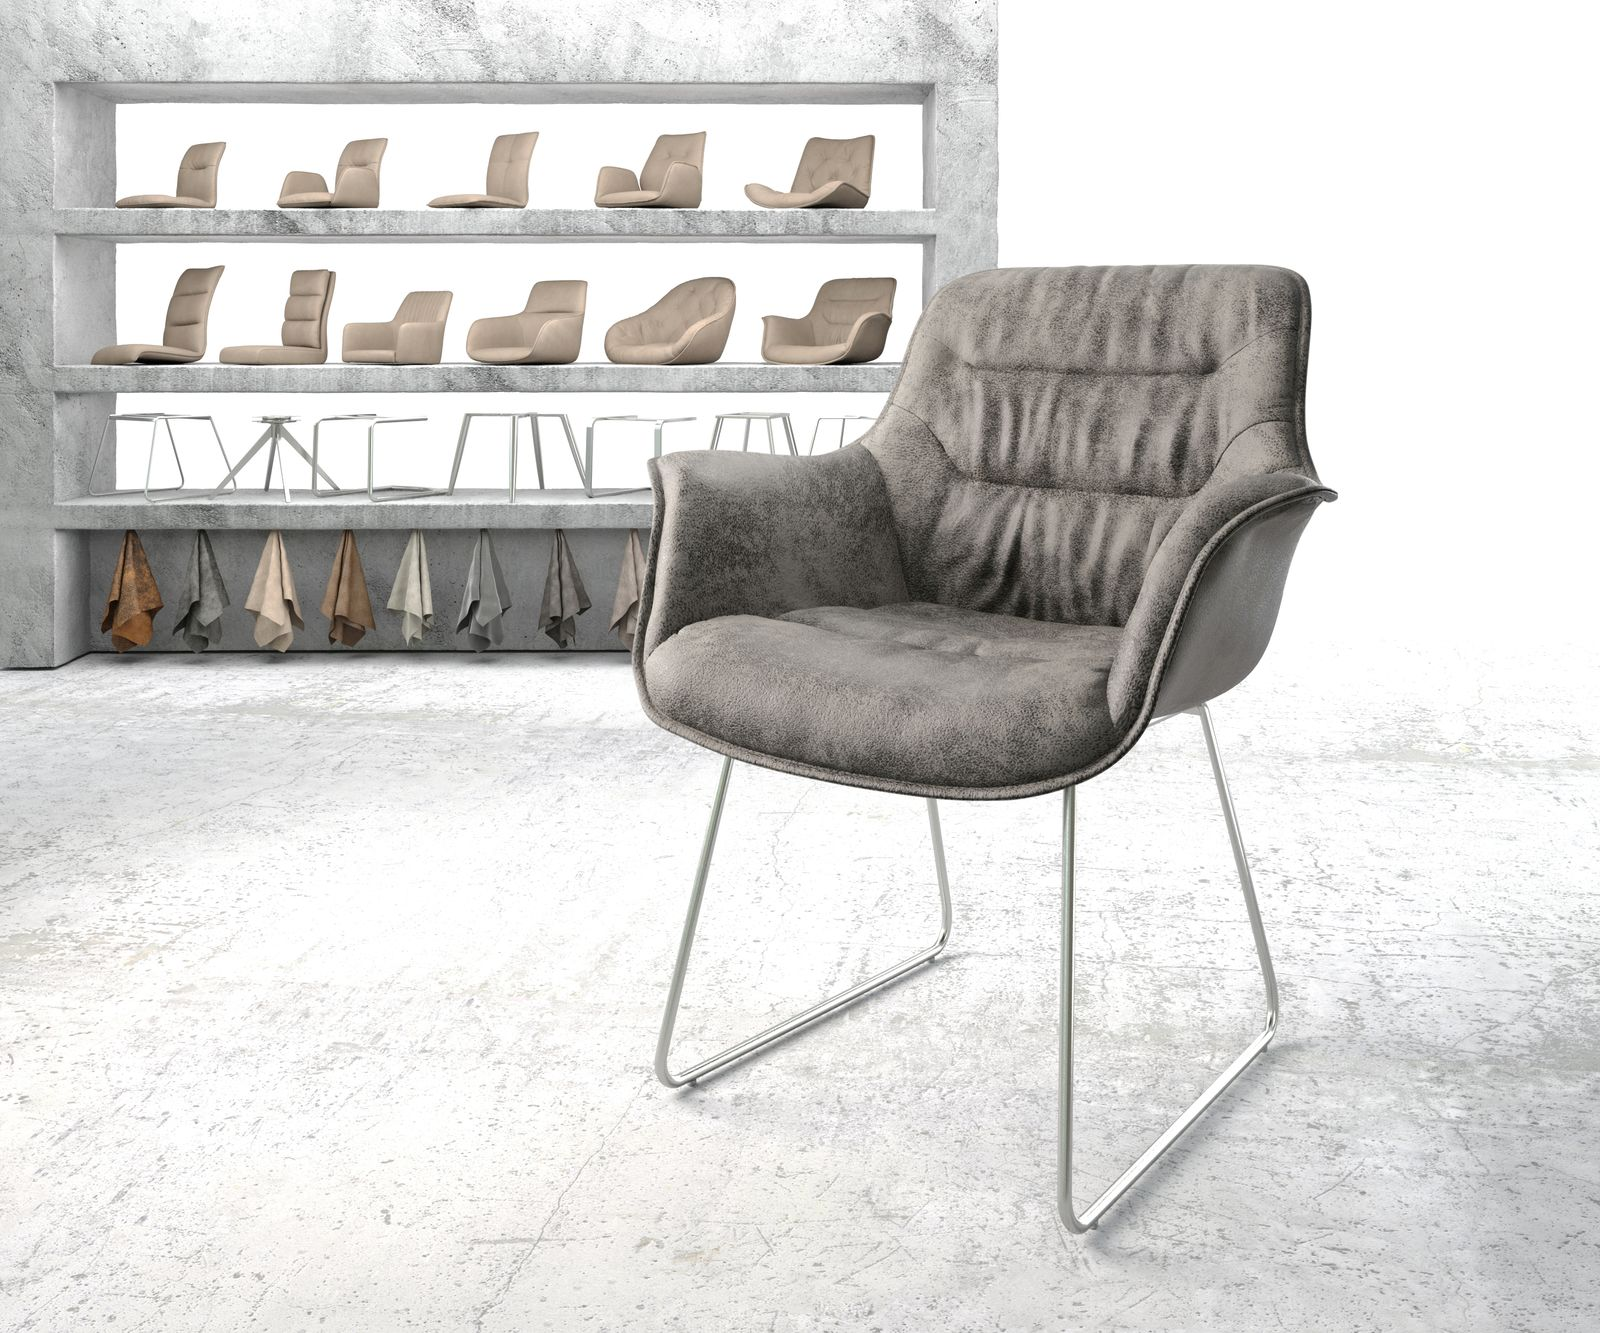 delife-armlehnstuhl-kaira-flex-grau-vintage-kufengestell-edelstahl-esszimmerstuhle